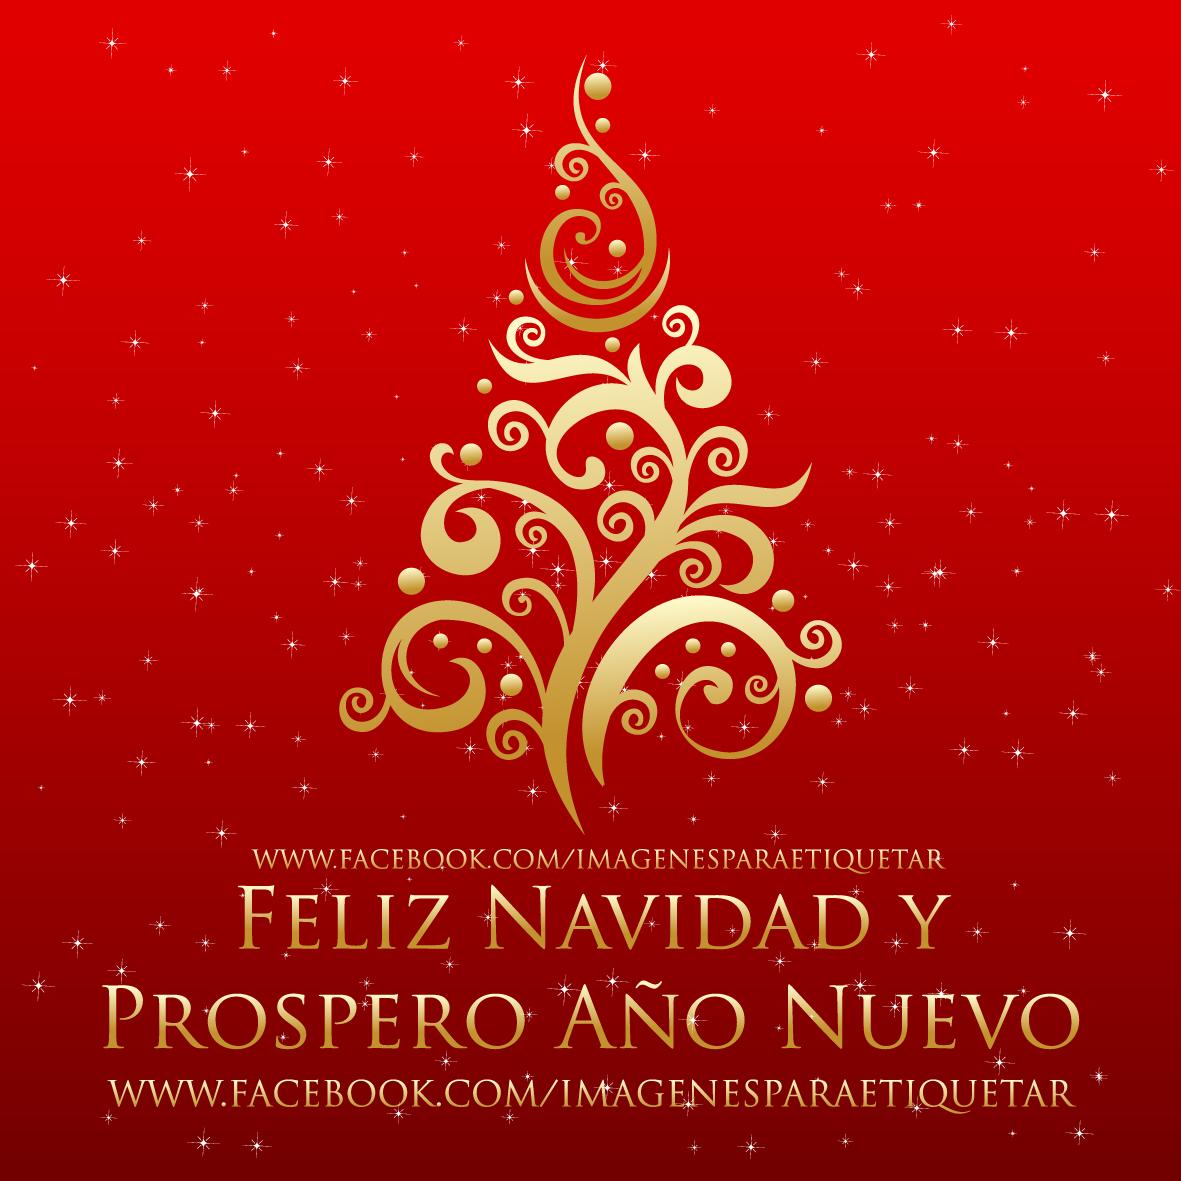 la navidad fecha: